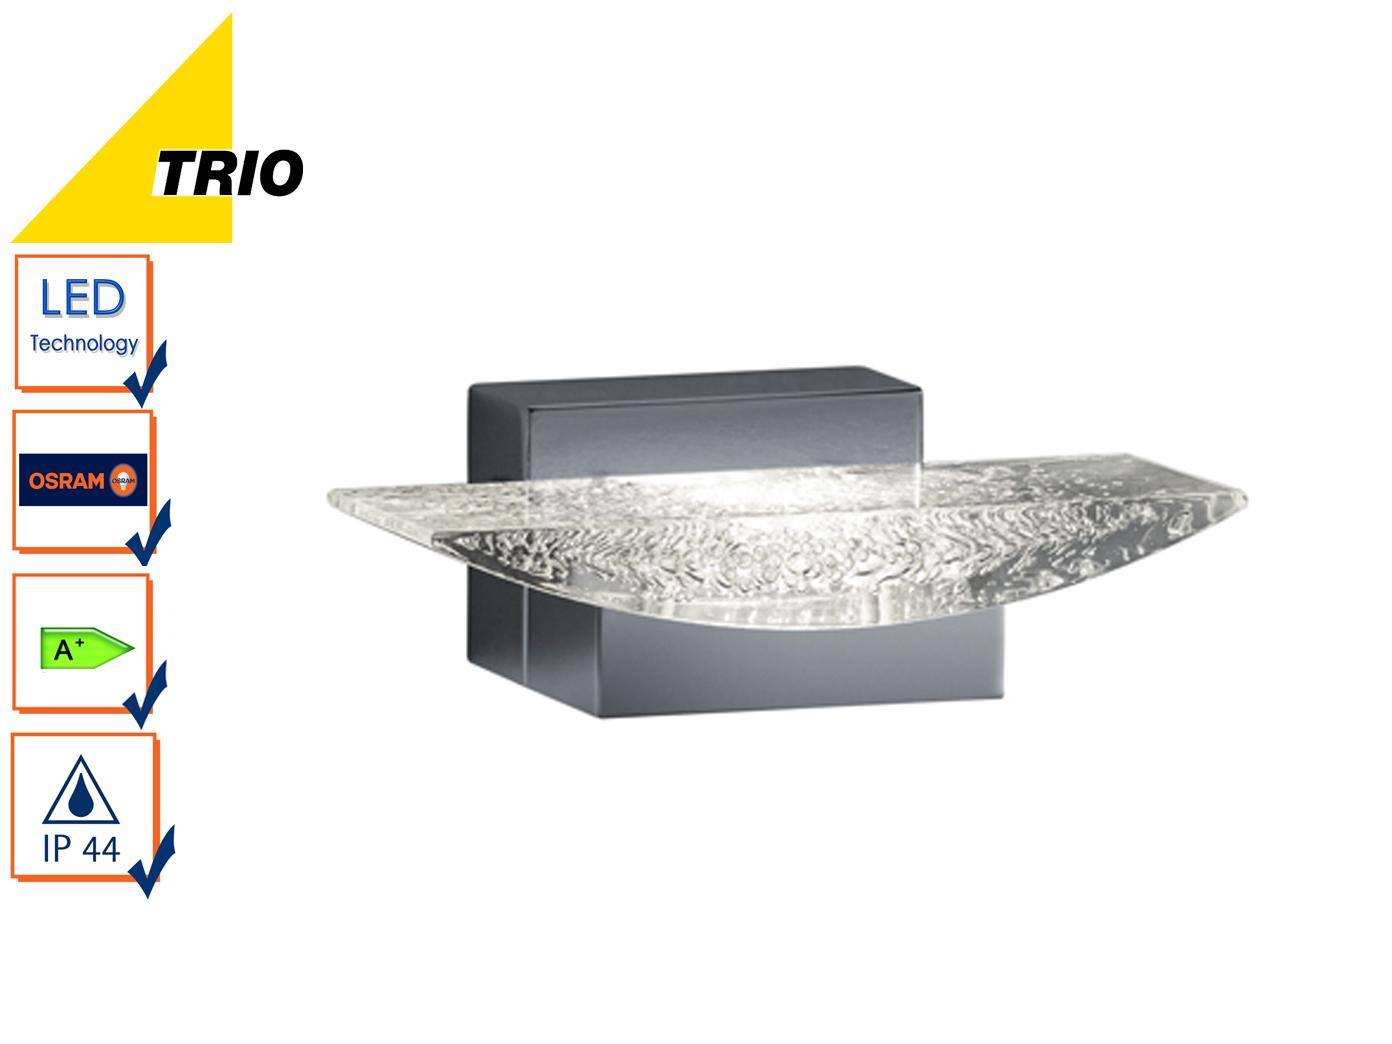 led wandlampe badlampe chrom leuchte badezimmer modern acryl mit blasen trio eur 59 99. Black Bedroom Furniture Sets. Home Design Ideas